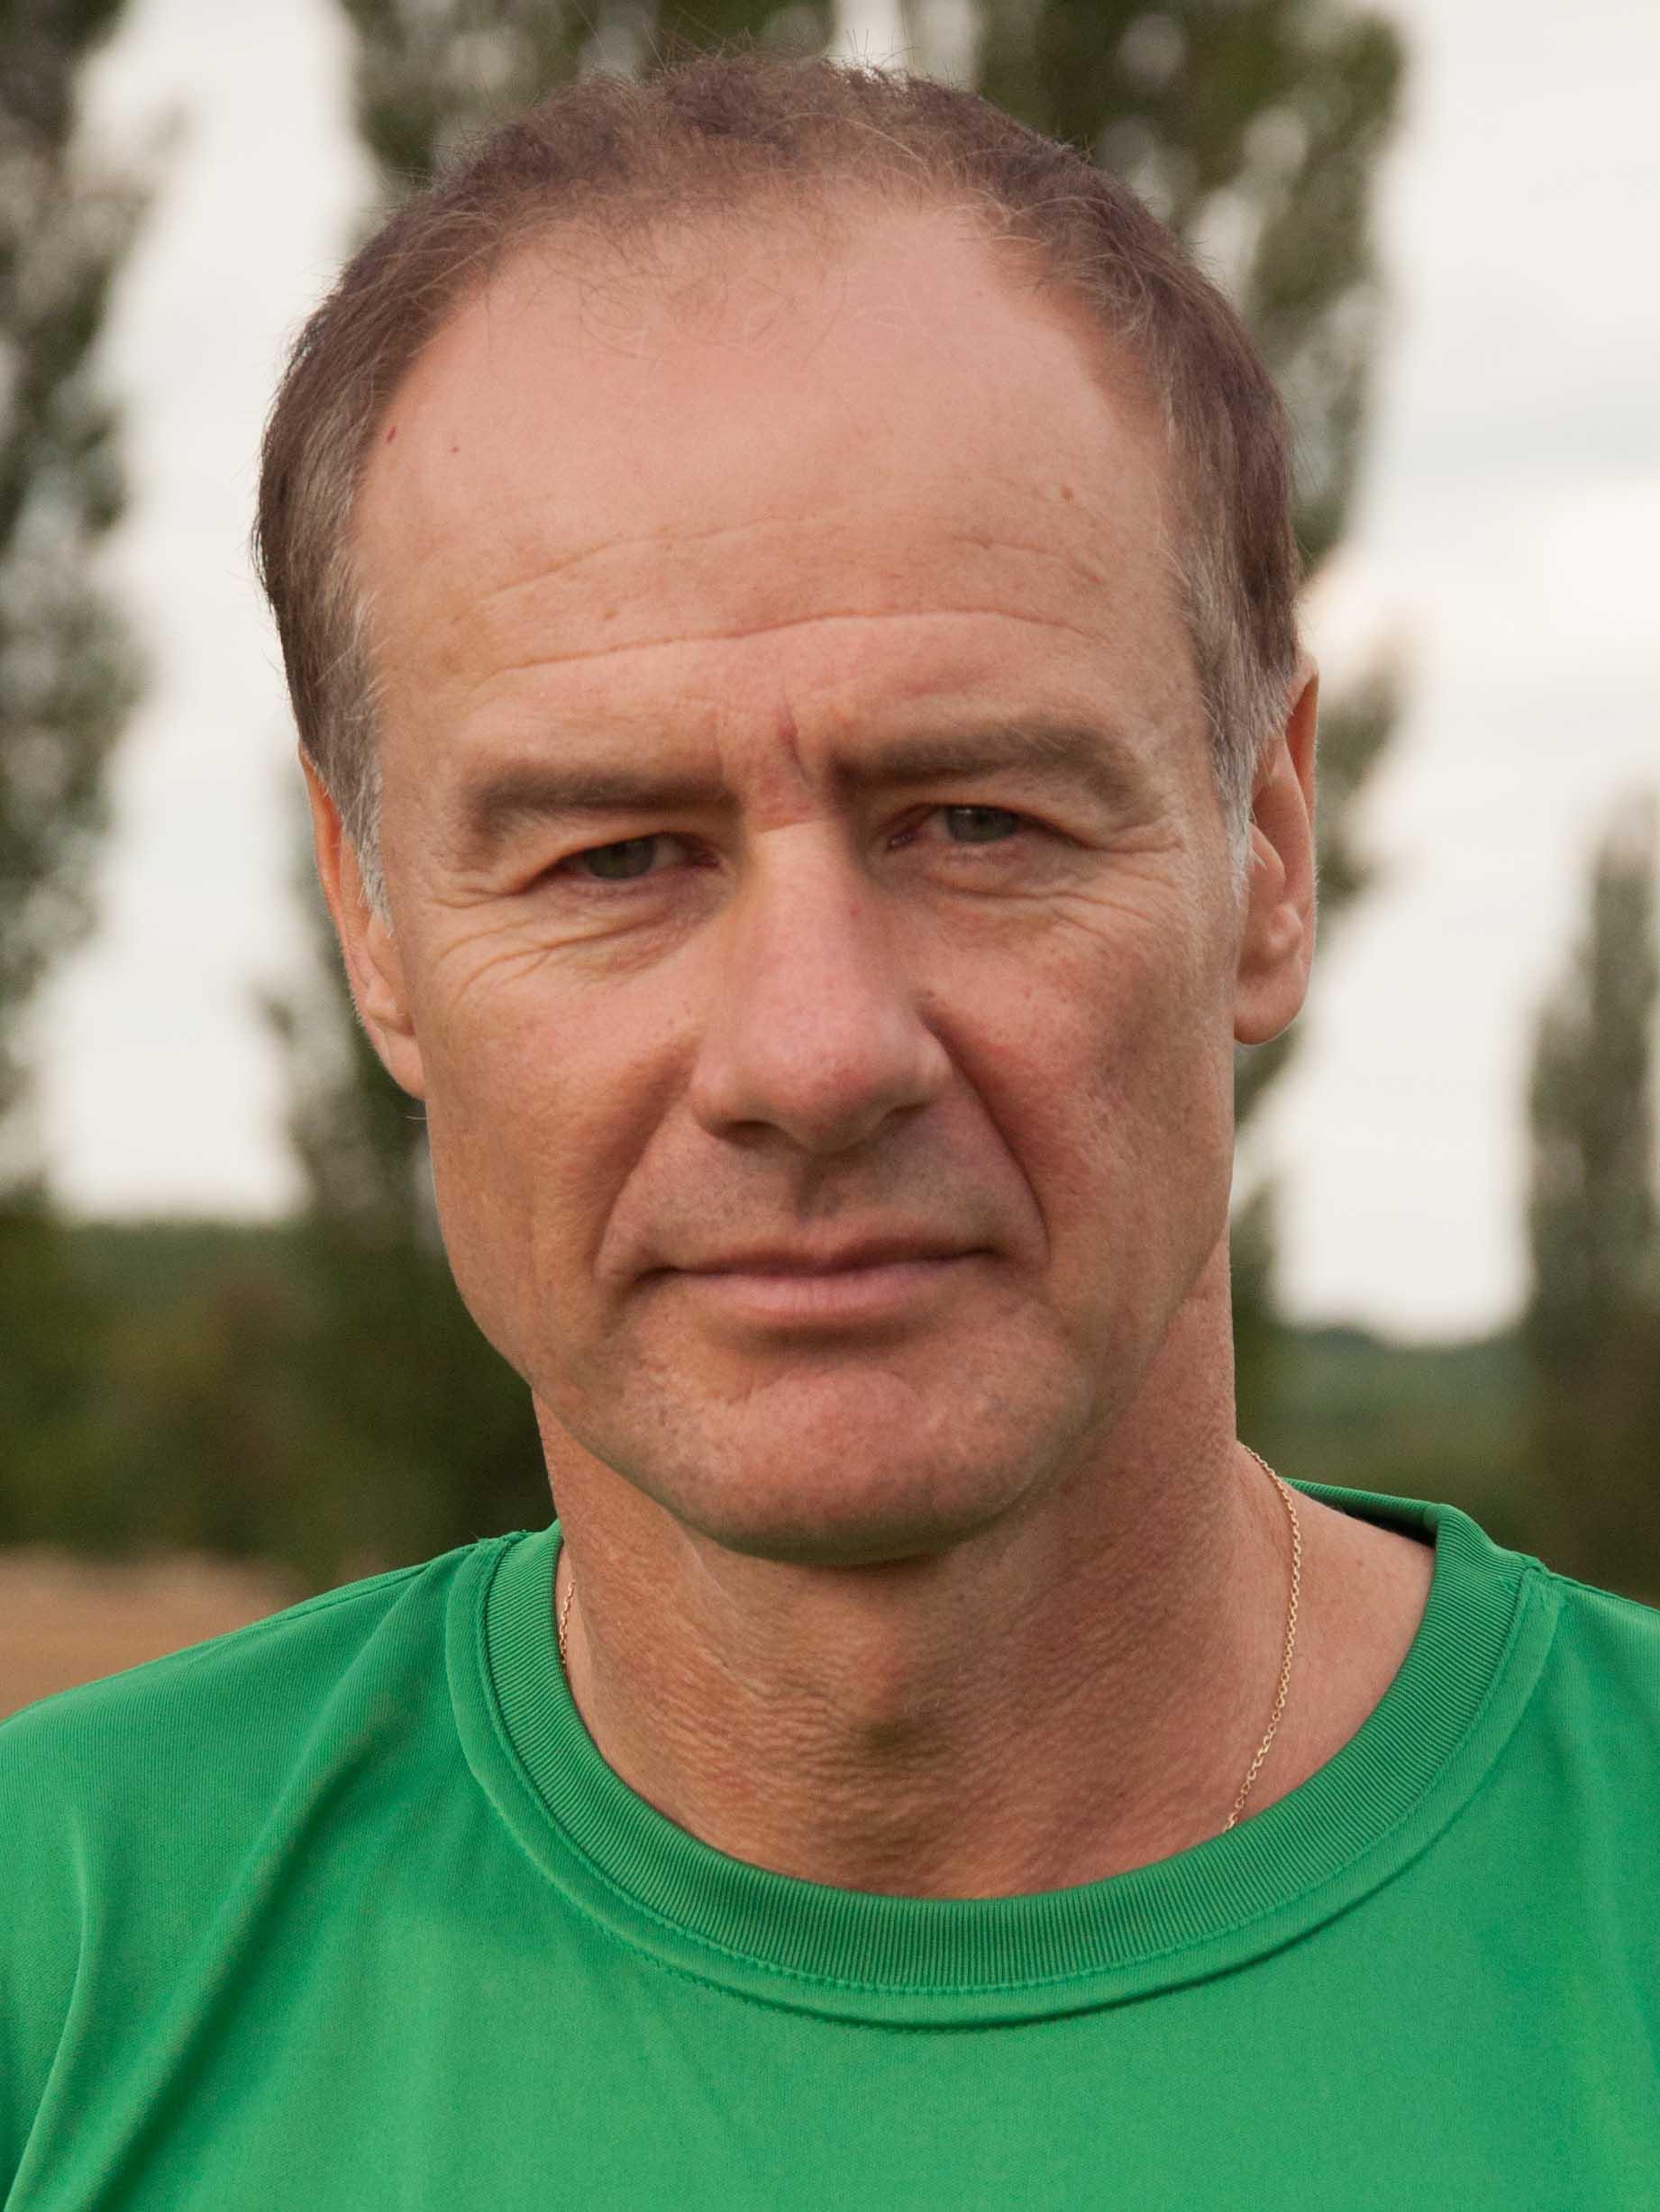 Christian Pekert